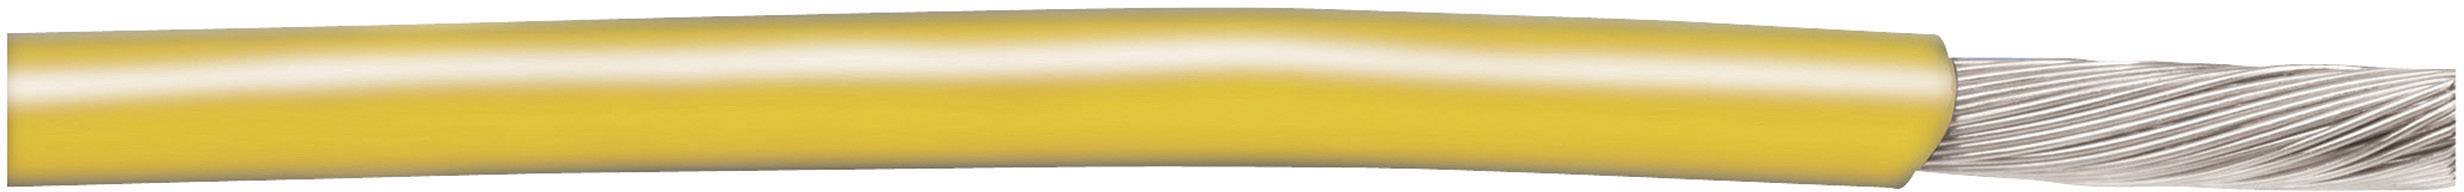 Opletenie / lanko AlphaWire 3073-005-YEL 1 x 0.50 mm², vonkajší Ø 2.56 mm, 30.5 m, žltá